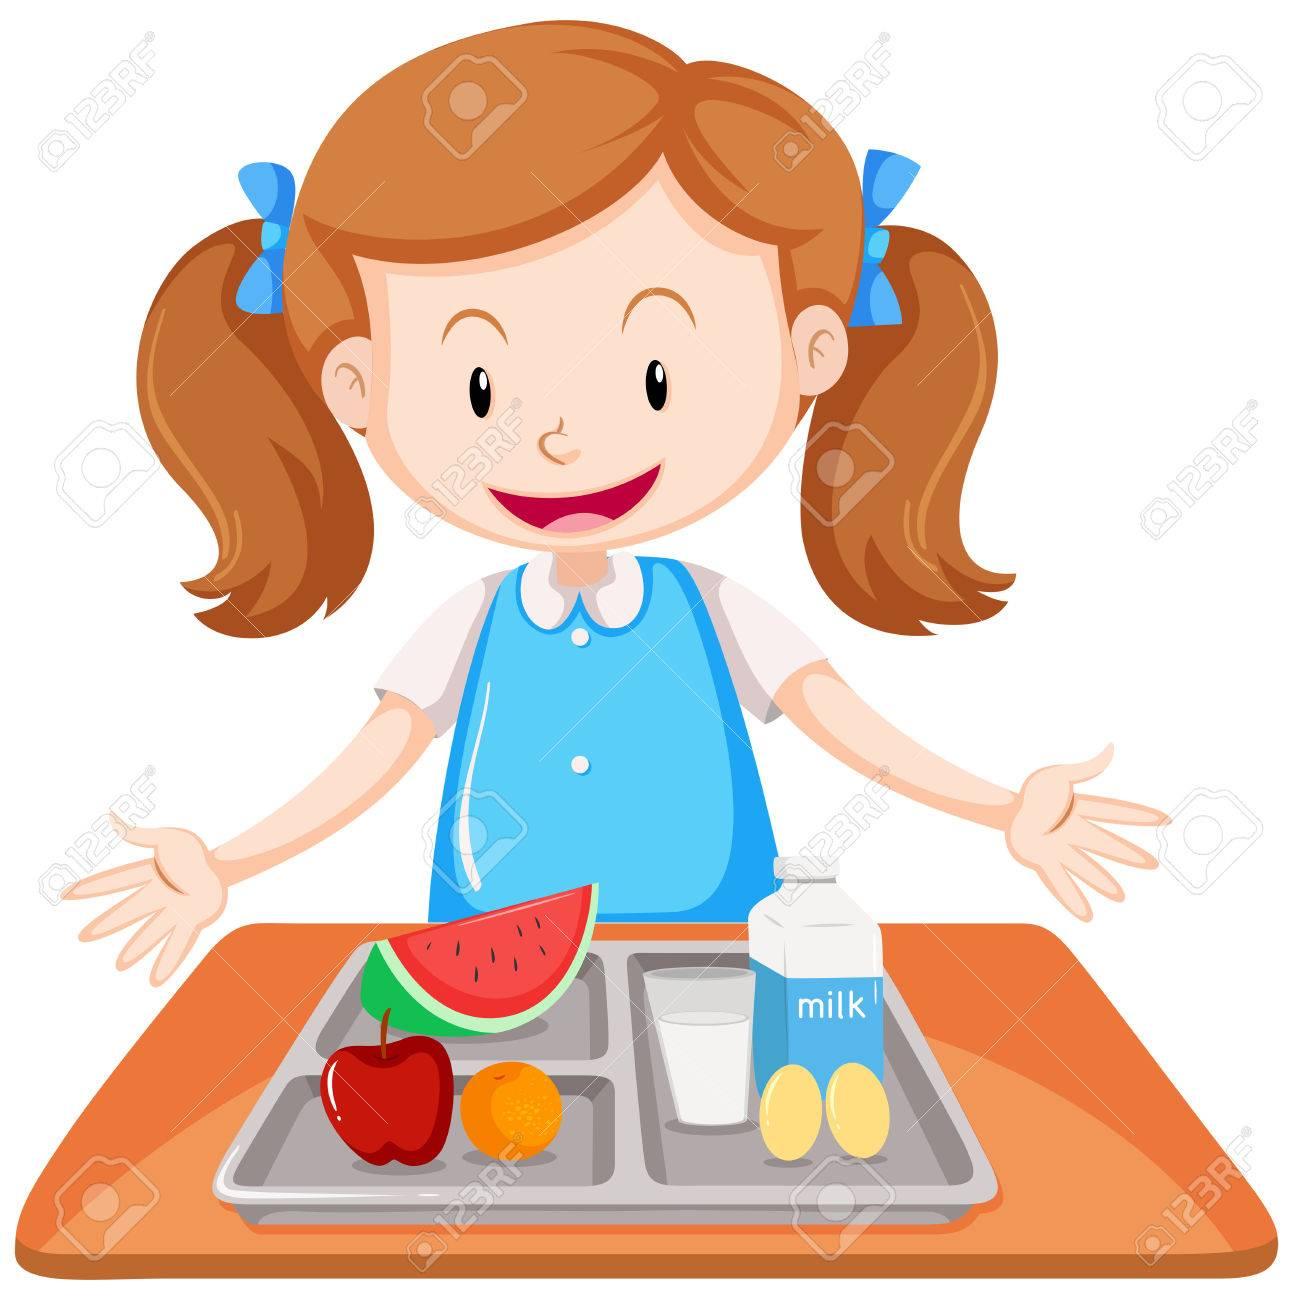 Girl having lunch on table illustration - 72869431